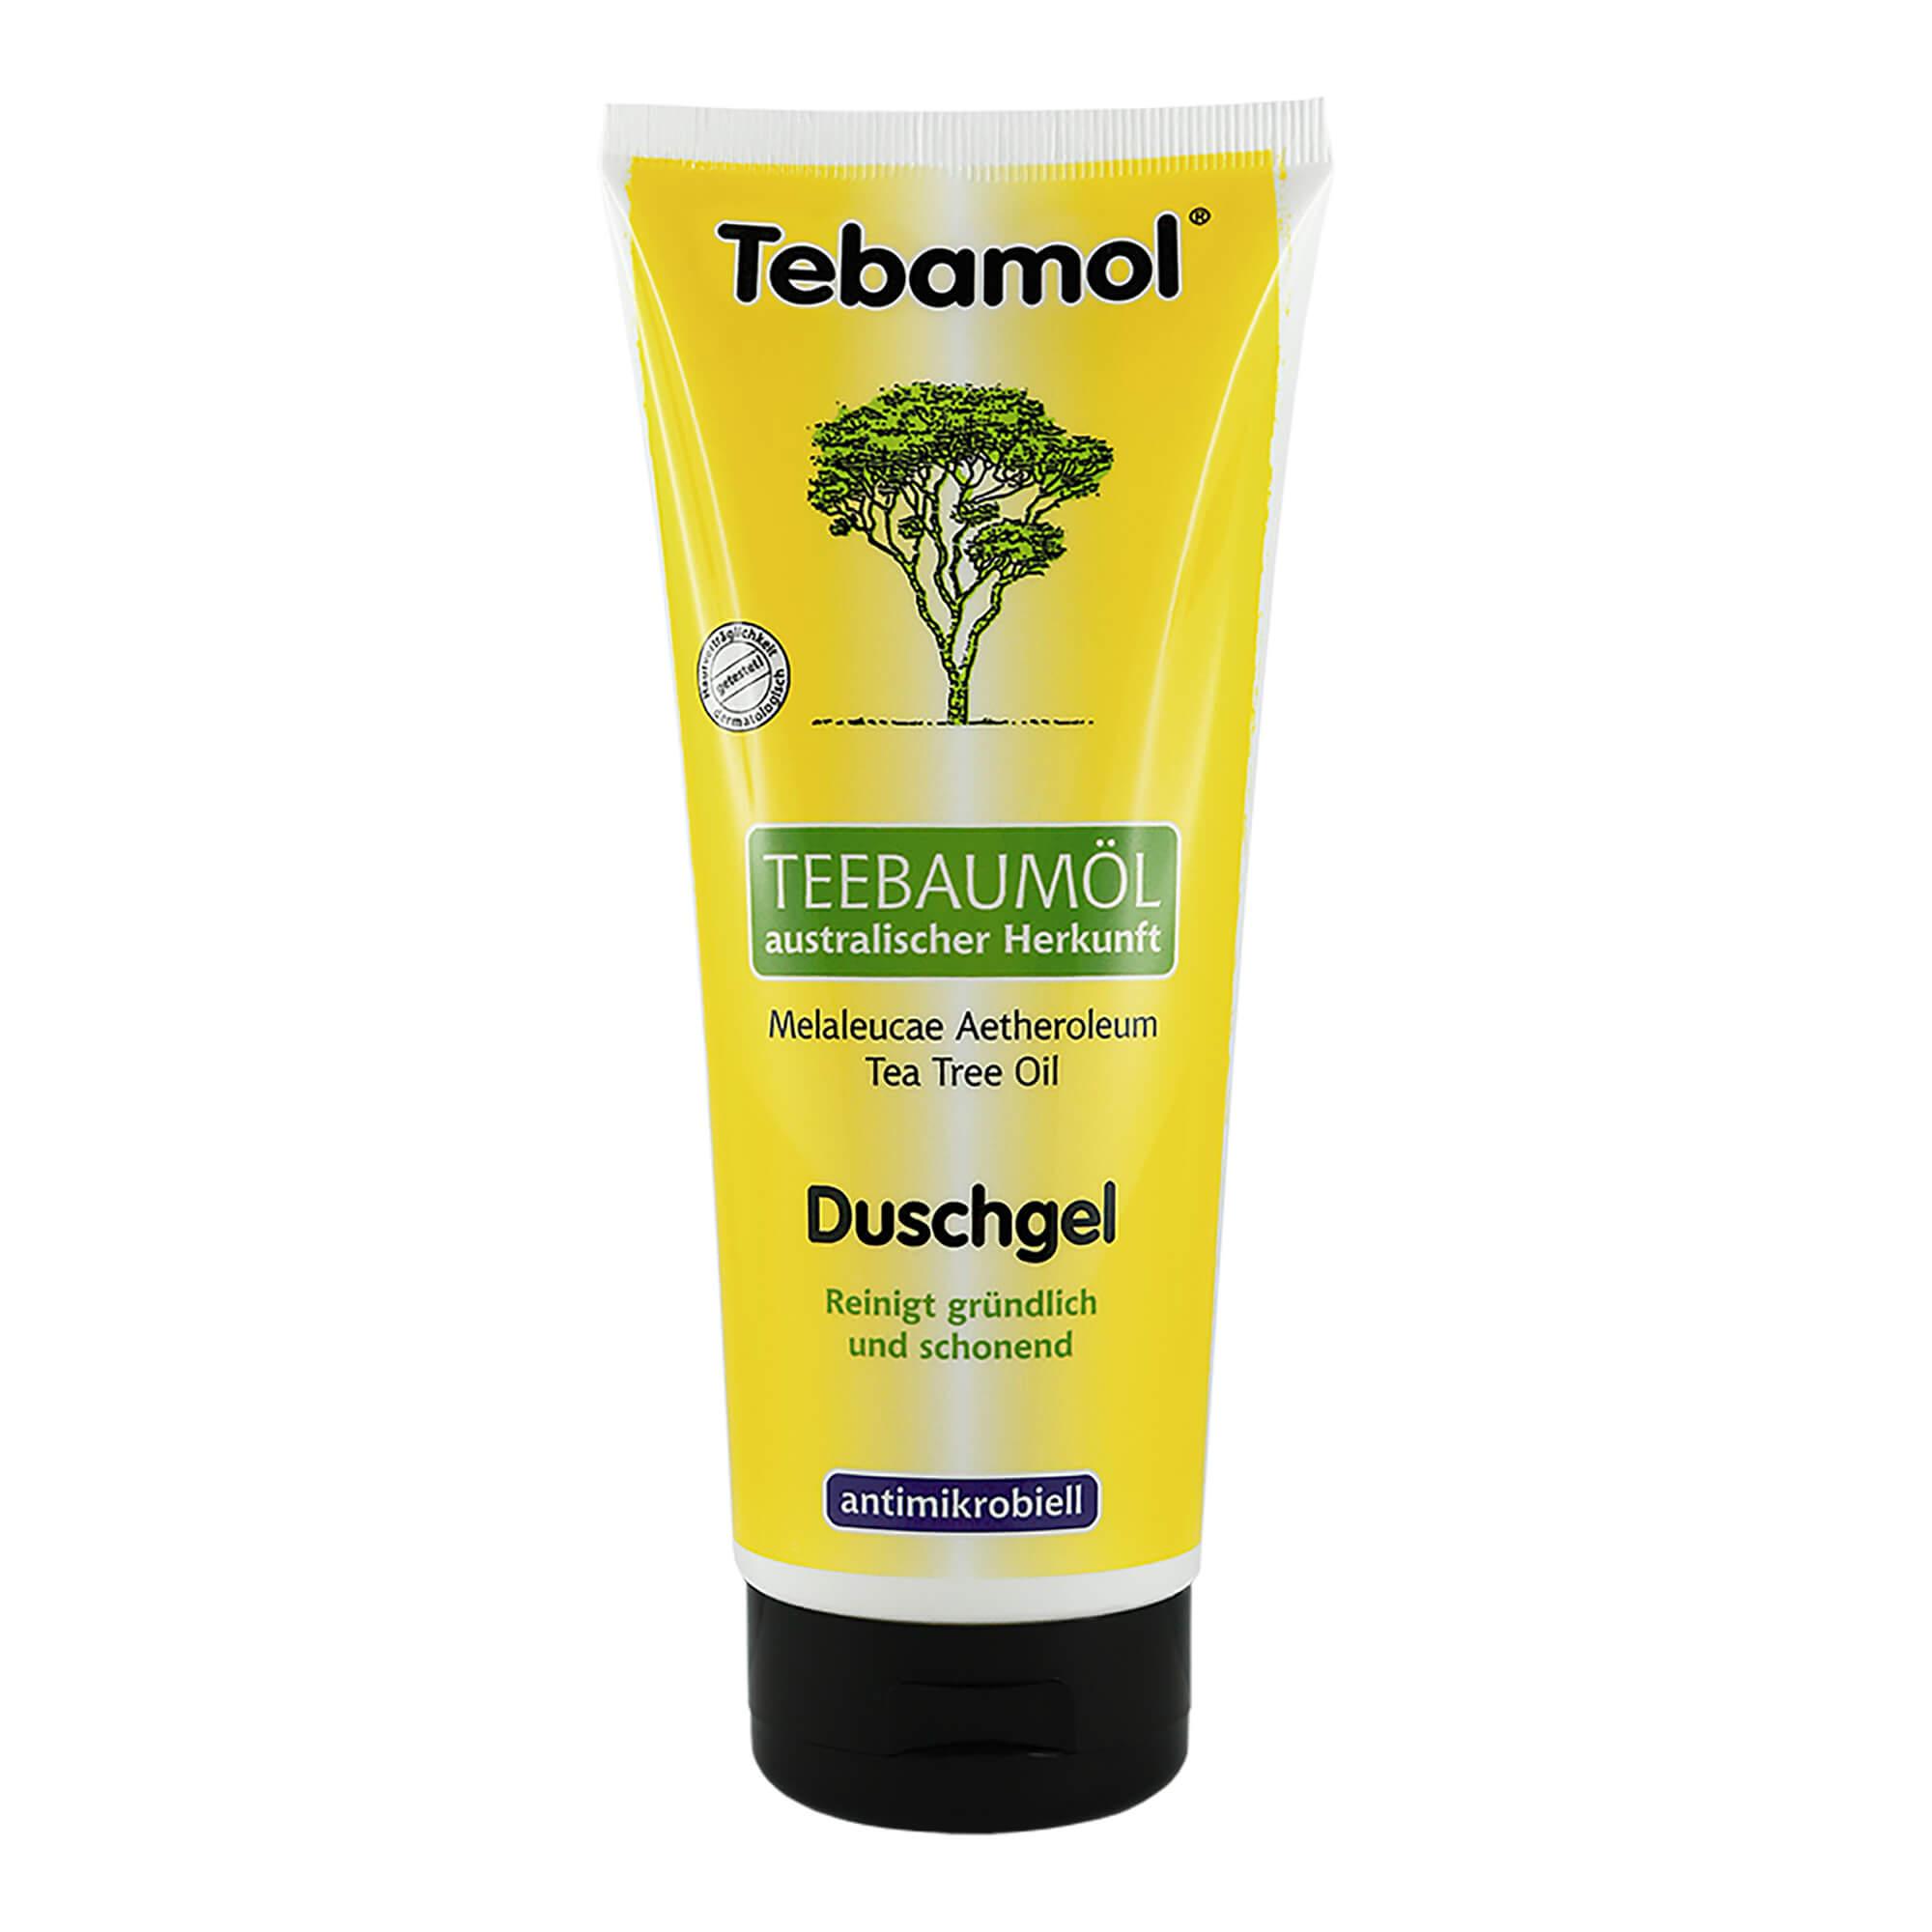 Tebamol Teebaumöl Duschgel